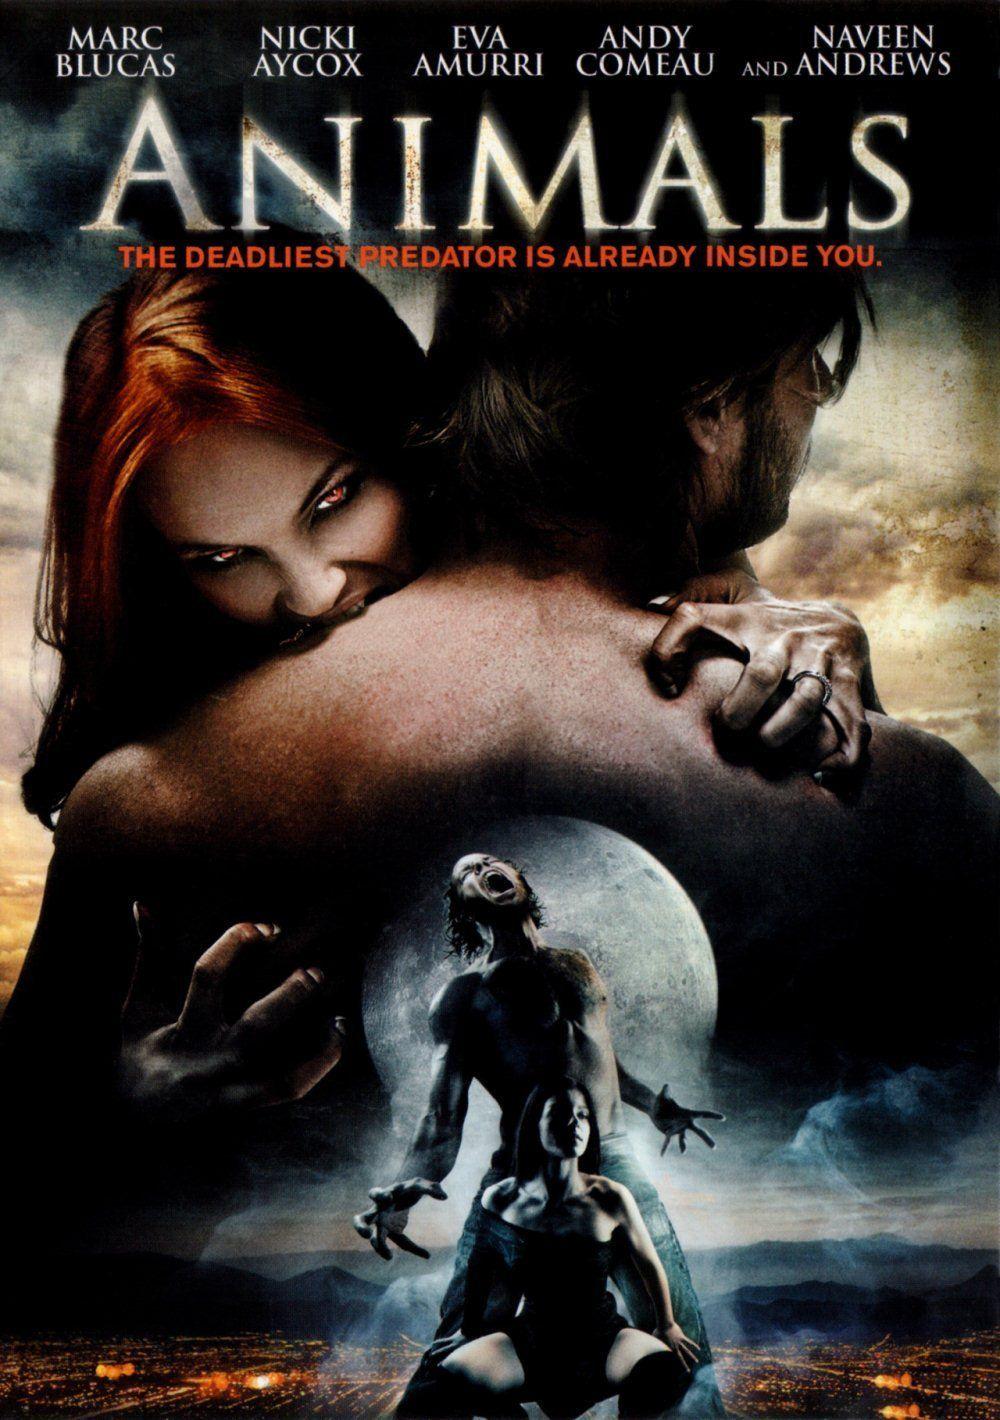 Animals (2008) Movie in 2020 Full films, Film, Movies